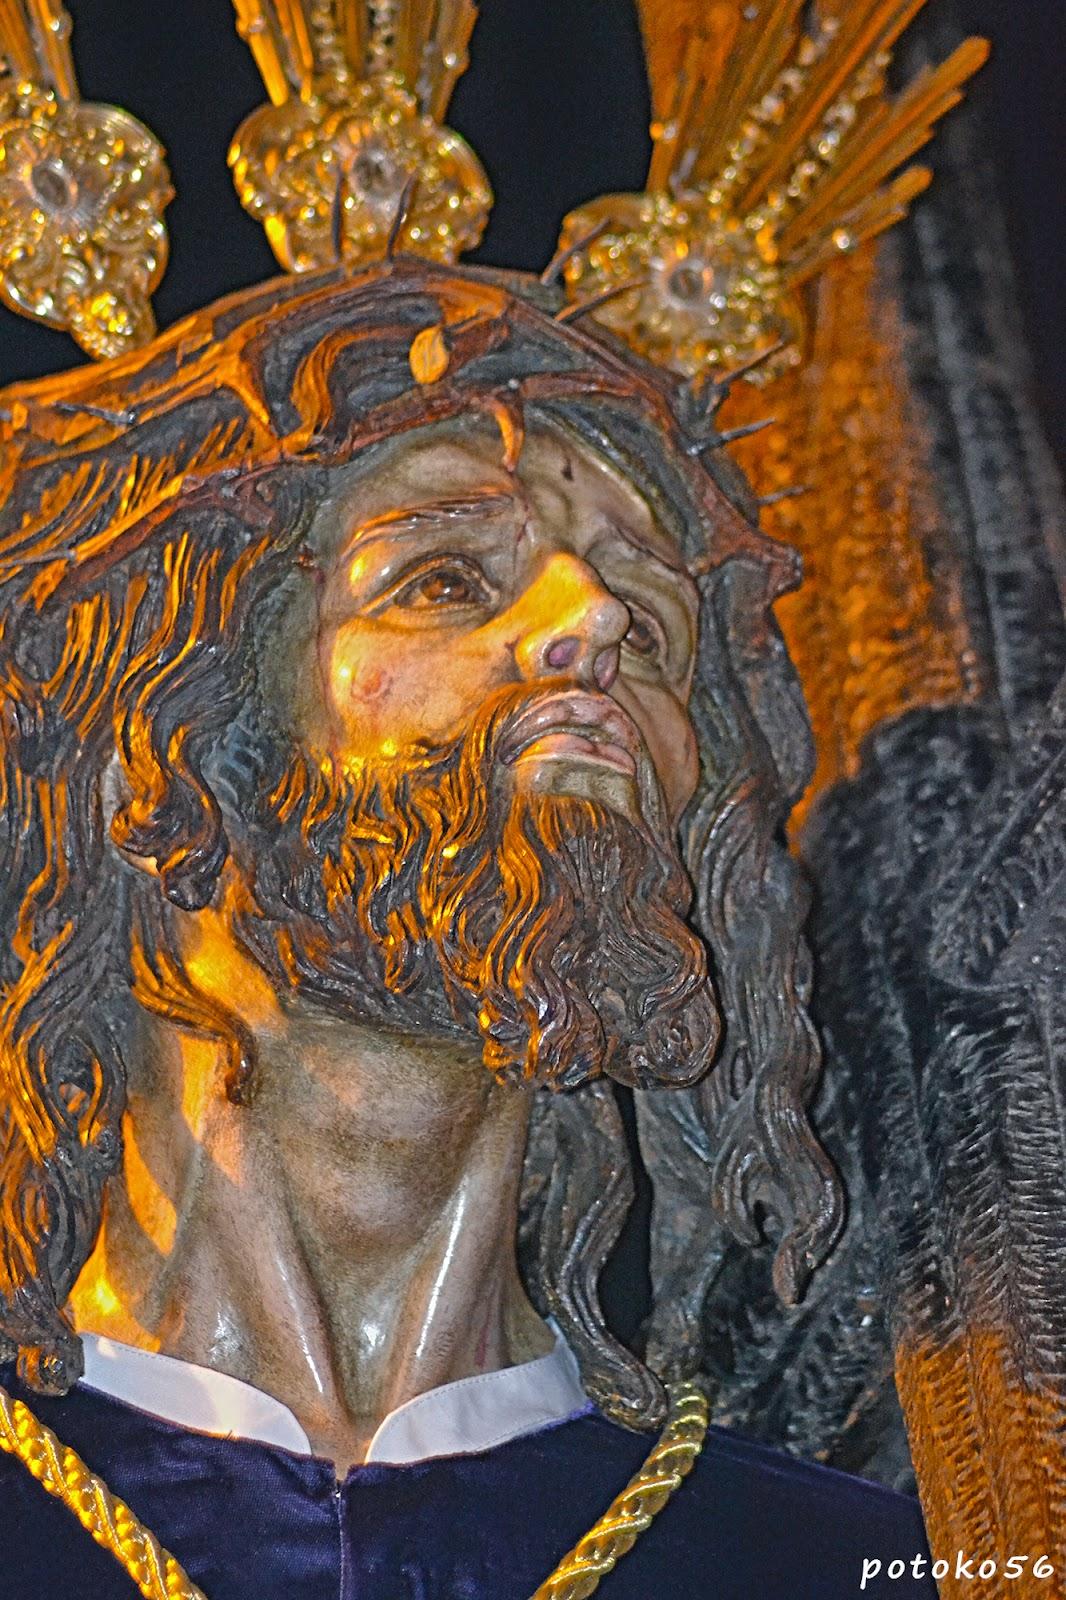 Semana Santa de Rota  Ntro. Padre Jesús de la Salud en sus Tres Caídas Rota